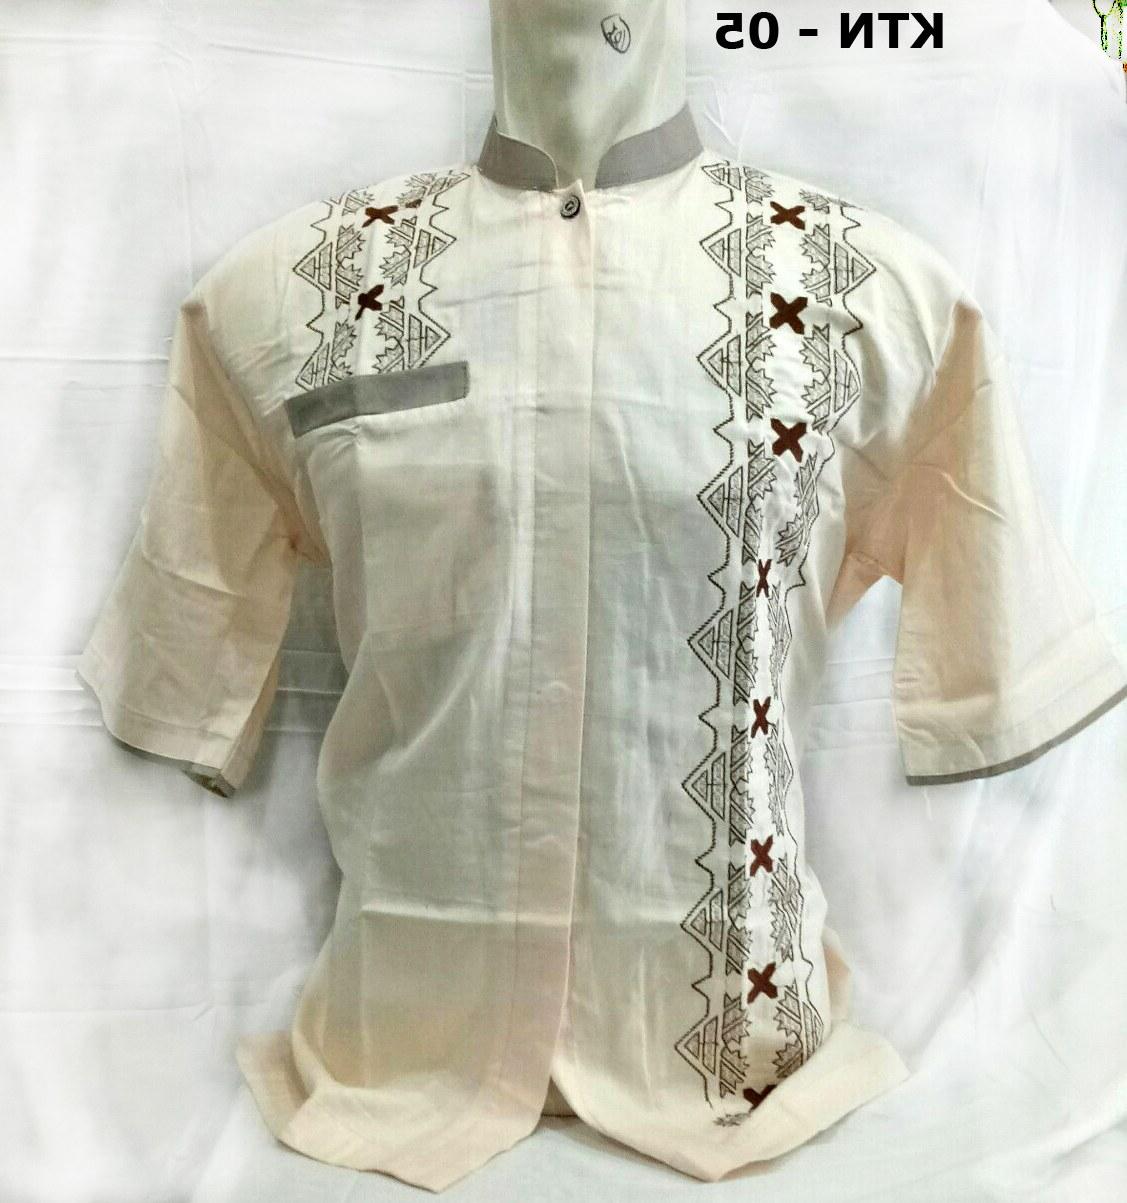 Inspirasi Model Baju Lebaran 2018 Terbaru Tldn Model Baju Koko Terbaru Lebaran 2018 Lengan Pendek Murah